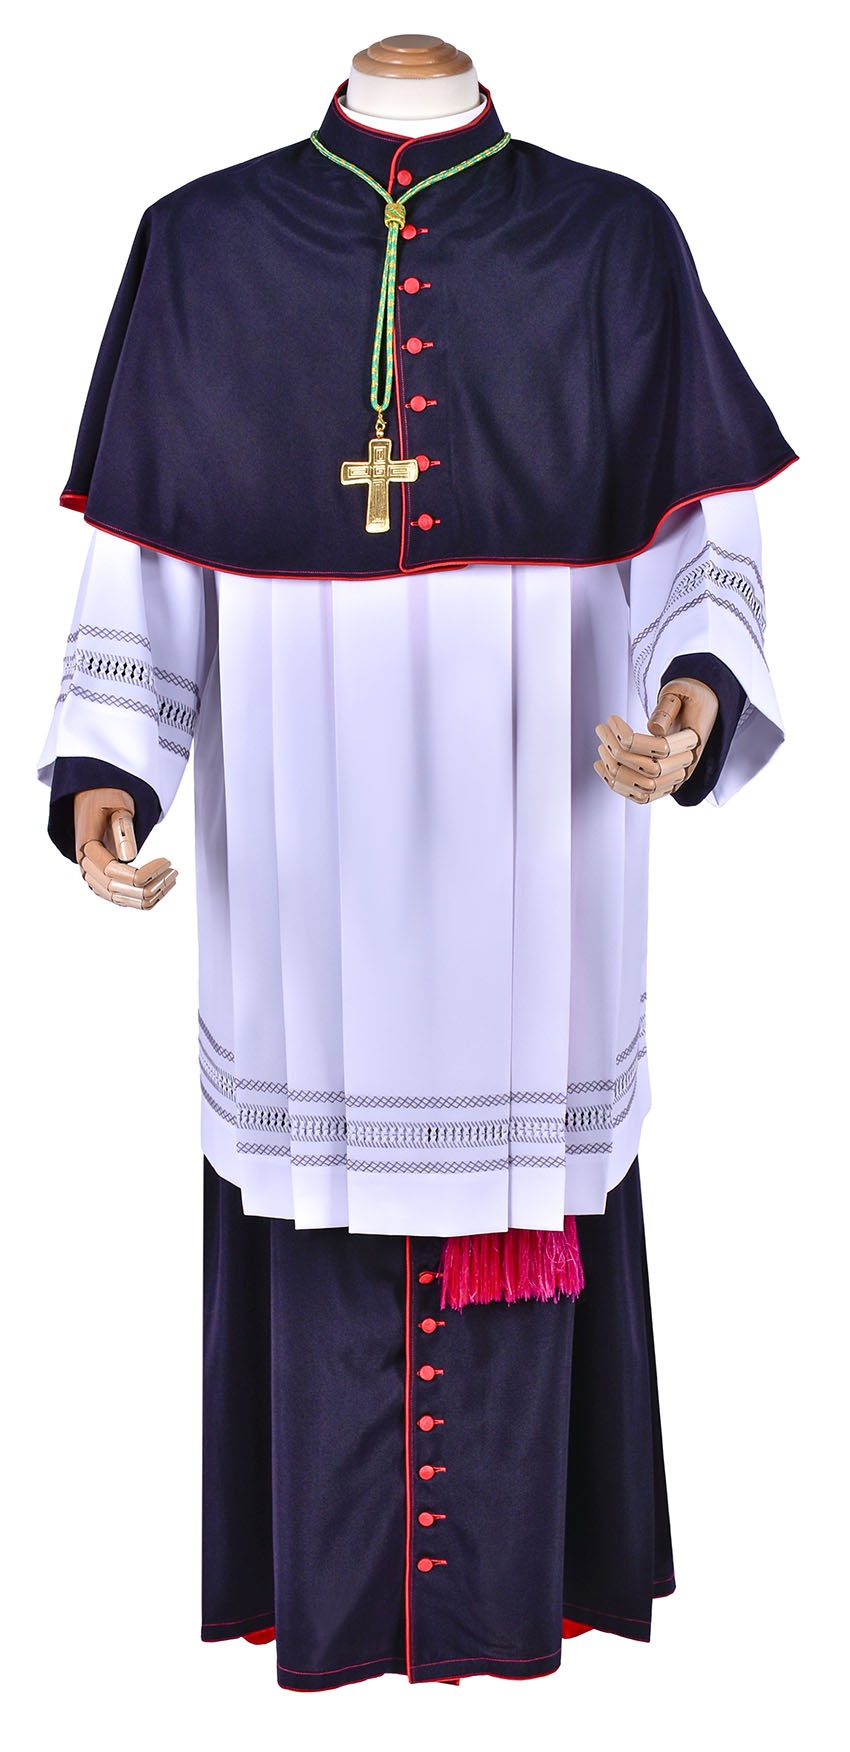 Mozeta Episcopal Lã Fria Preta MZ602